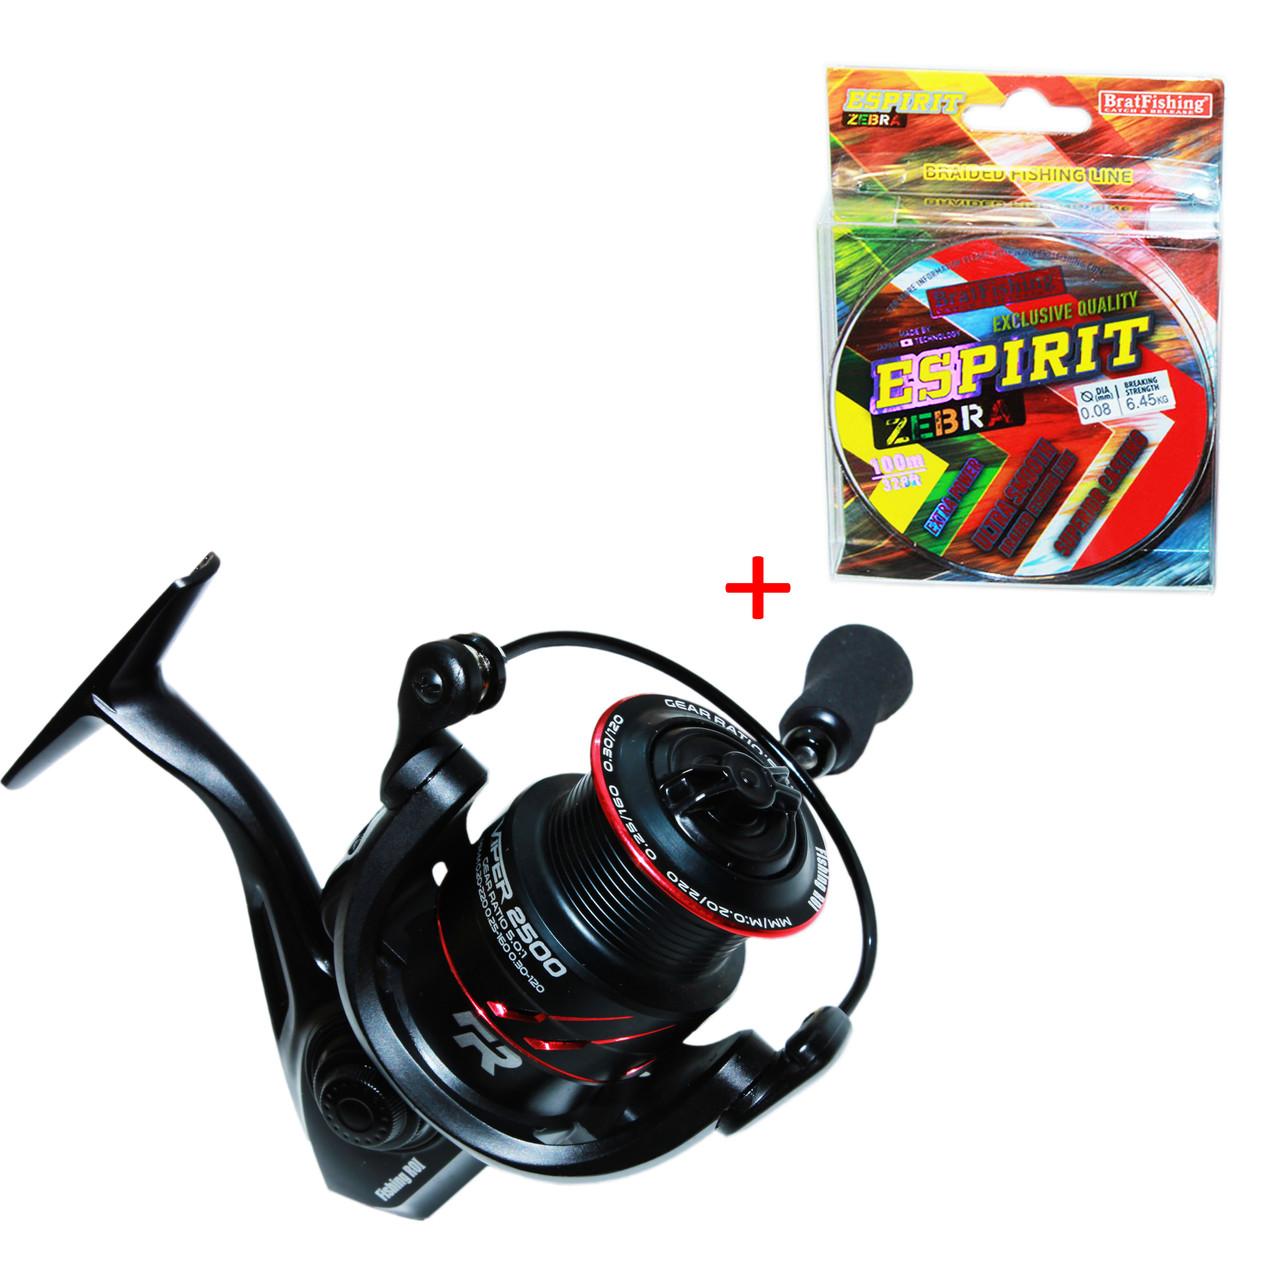 Котушка Fishing ROI Viper 2500 FD (5+1) + Шнур BratFishing Espirit Zebra на 8 ниток